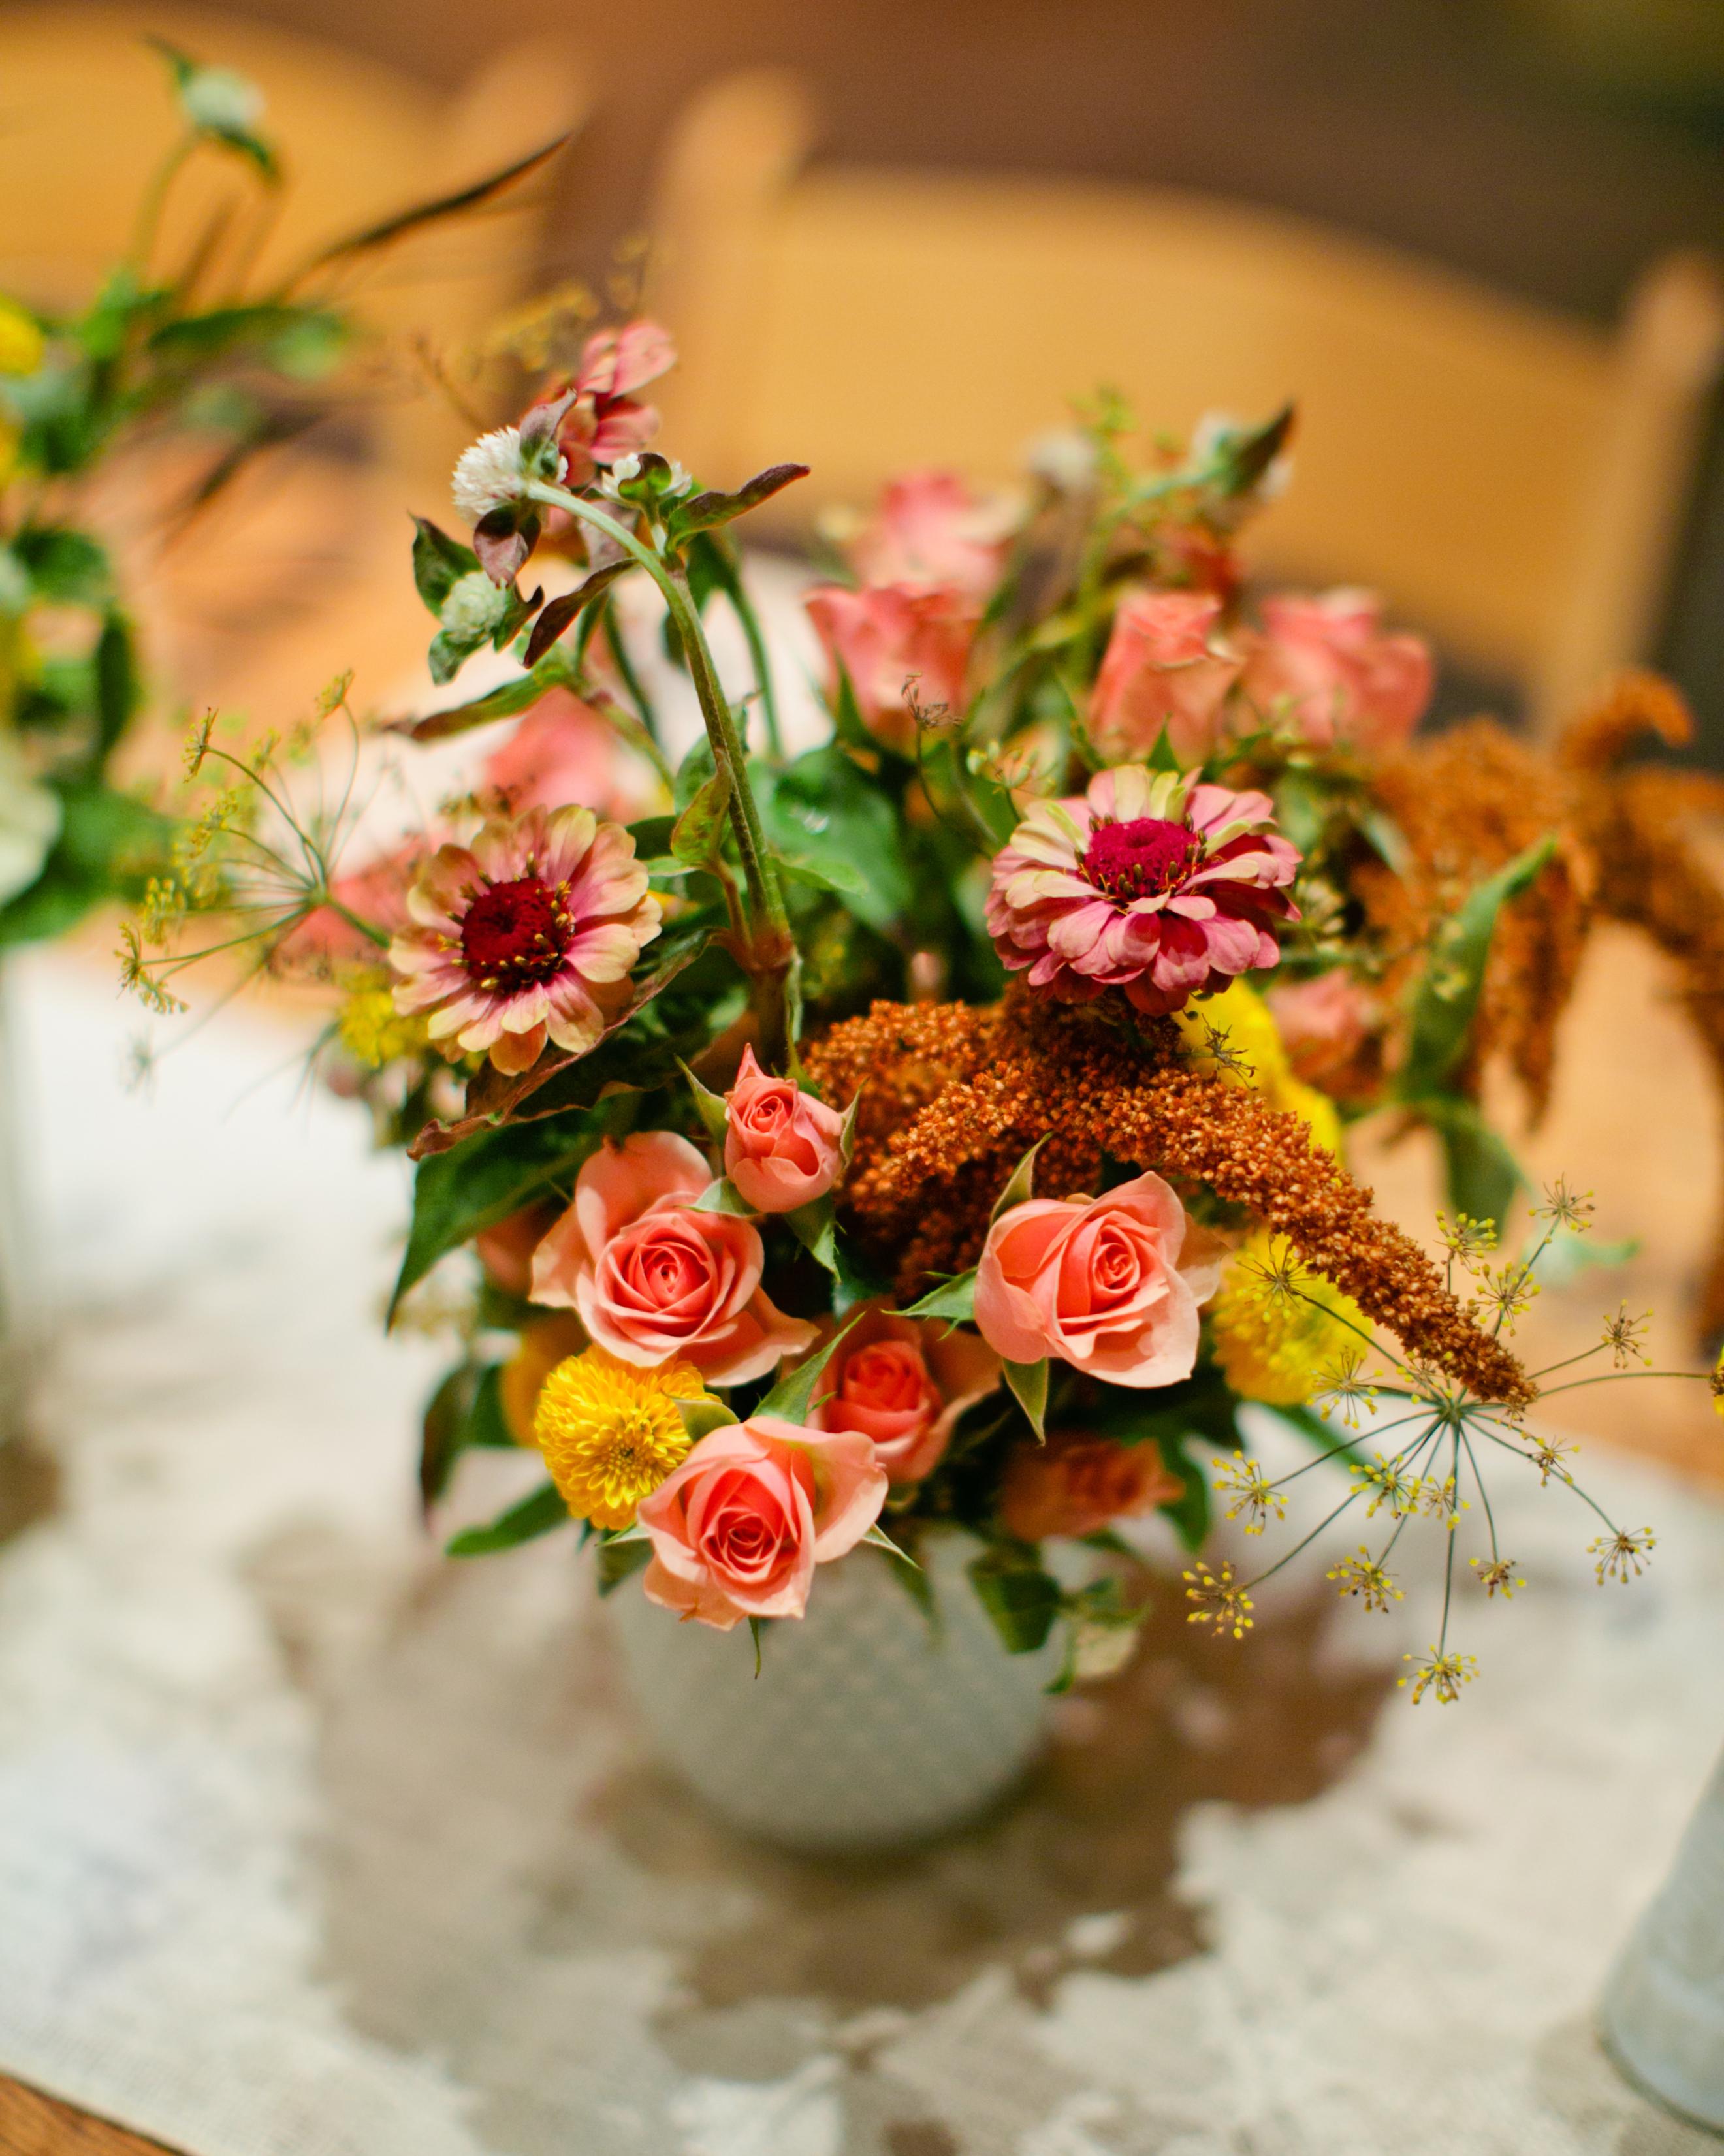 jess-steve-wedding-centerpiece-54-s112362-1115.jpg